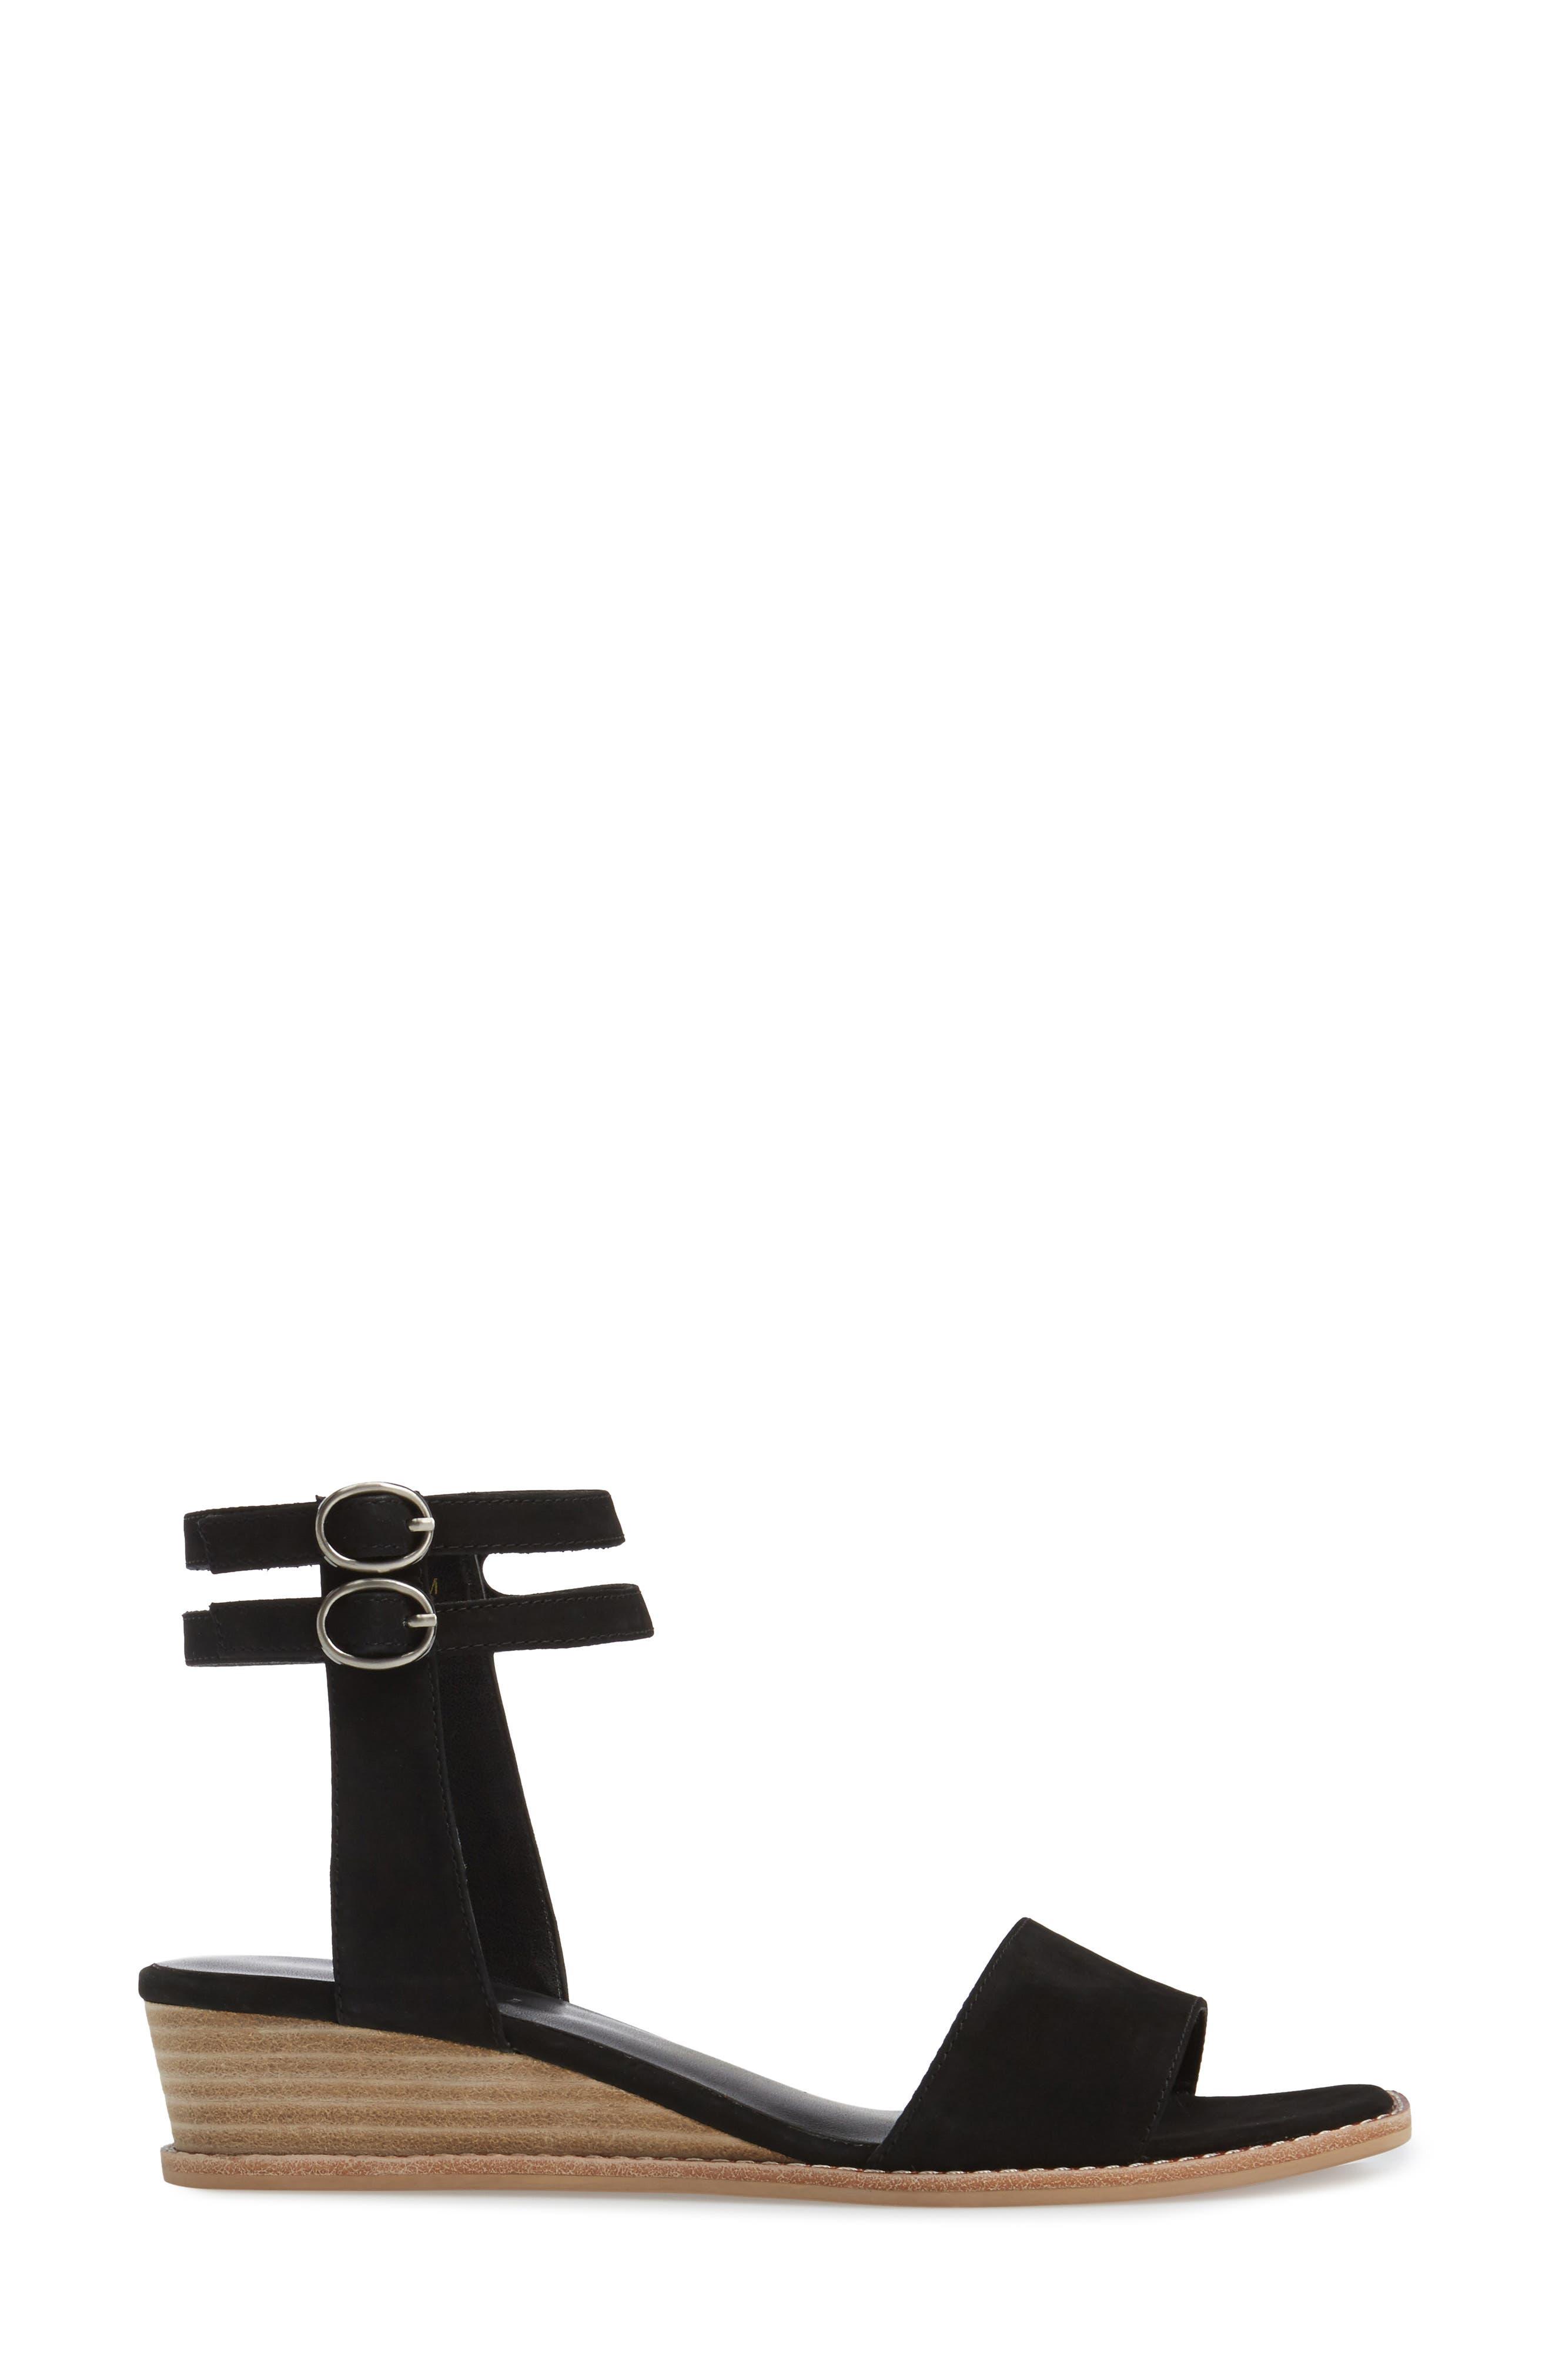 Jarita Ankle Strap Sandal,                             Alternate thumbnail 3, color,                             001